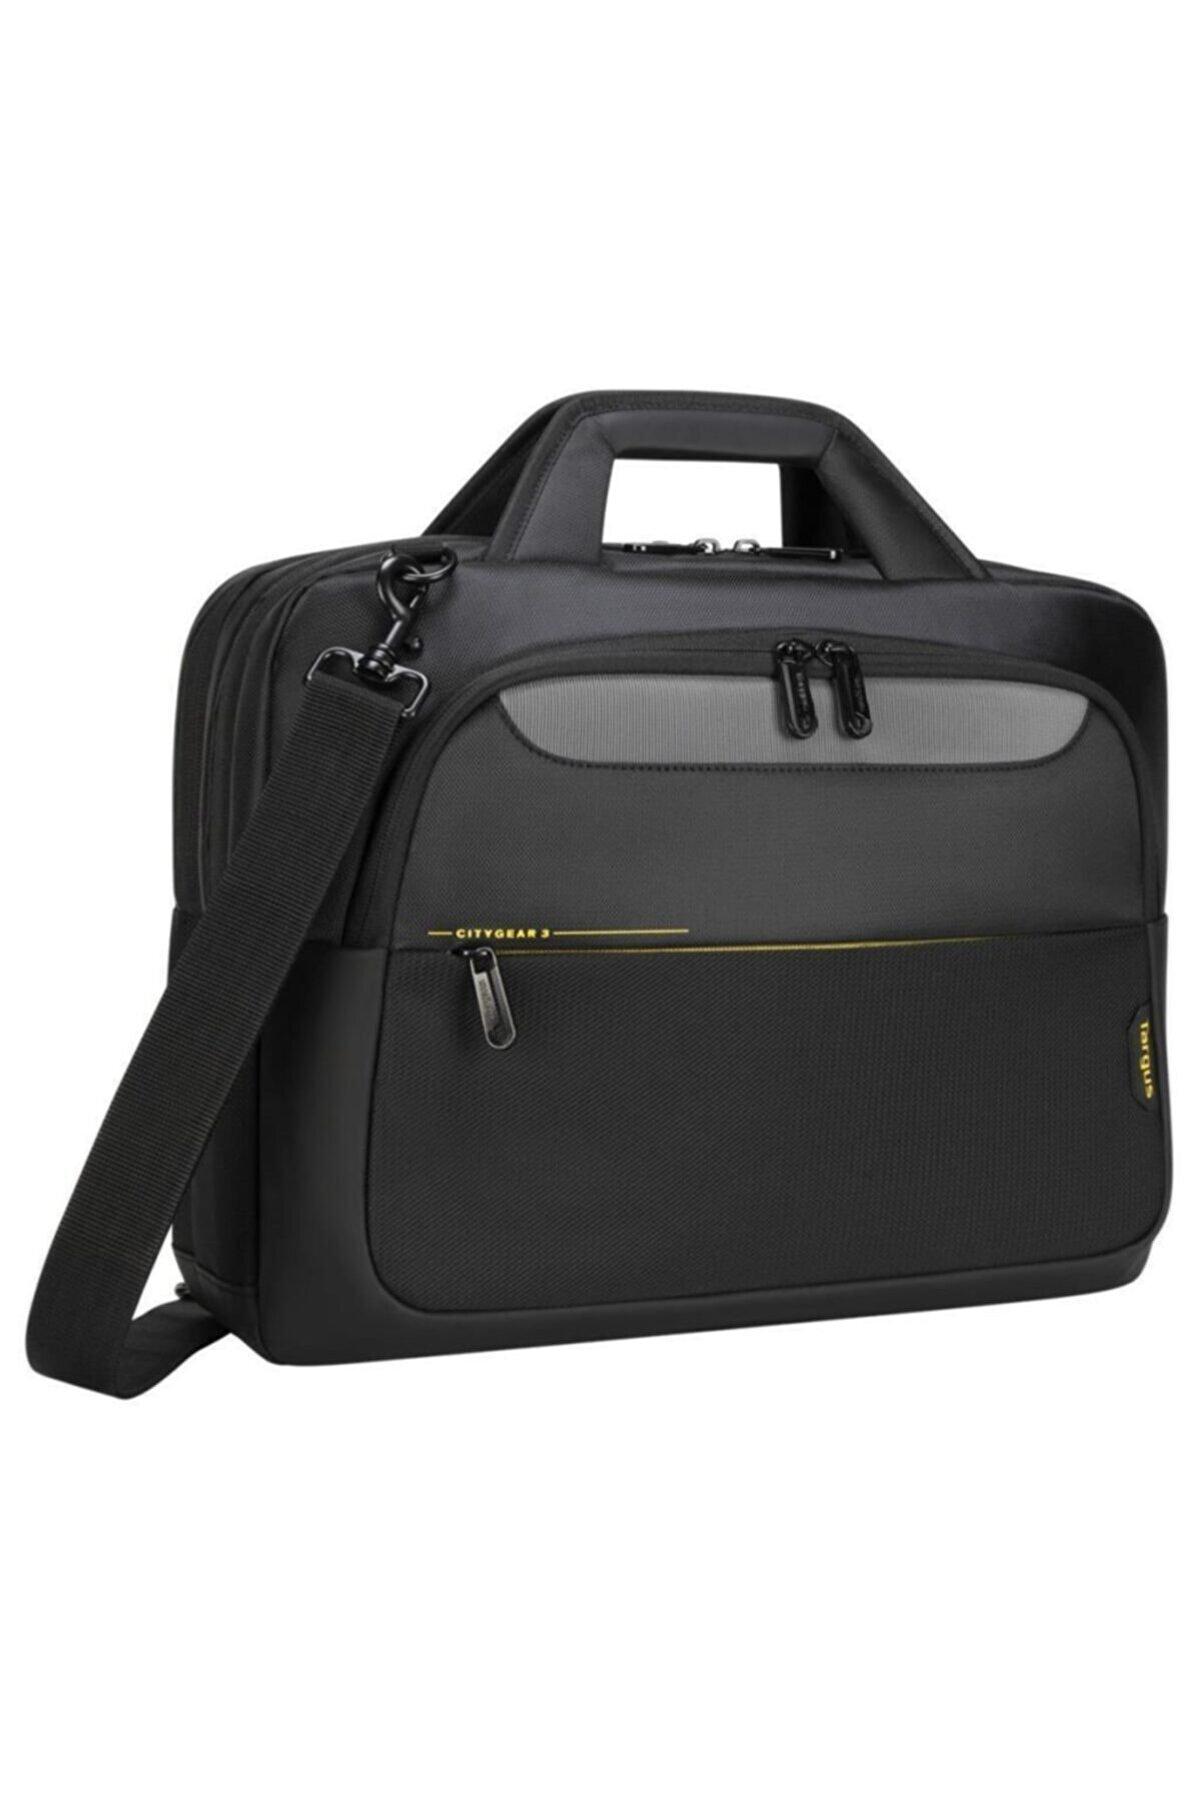 "Targus Citygear 15-17.3"" Topload Laptop Case Black"